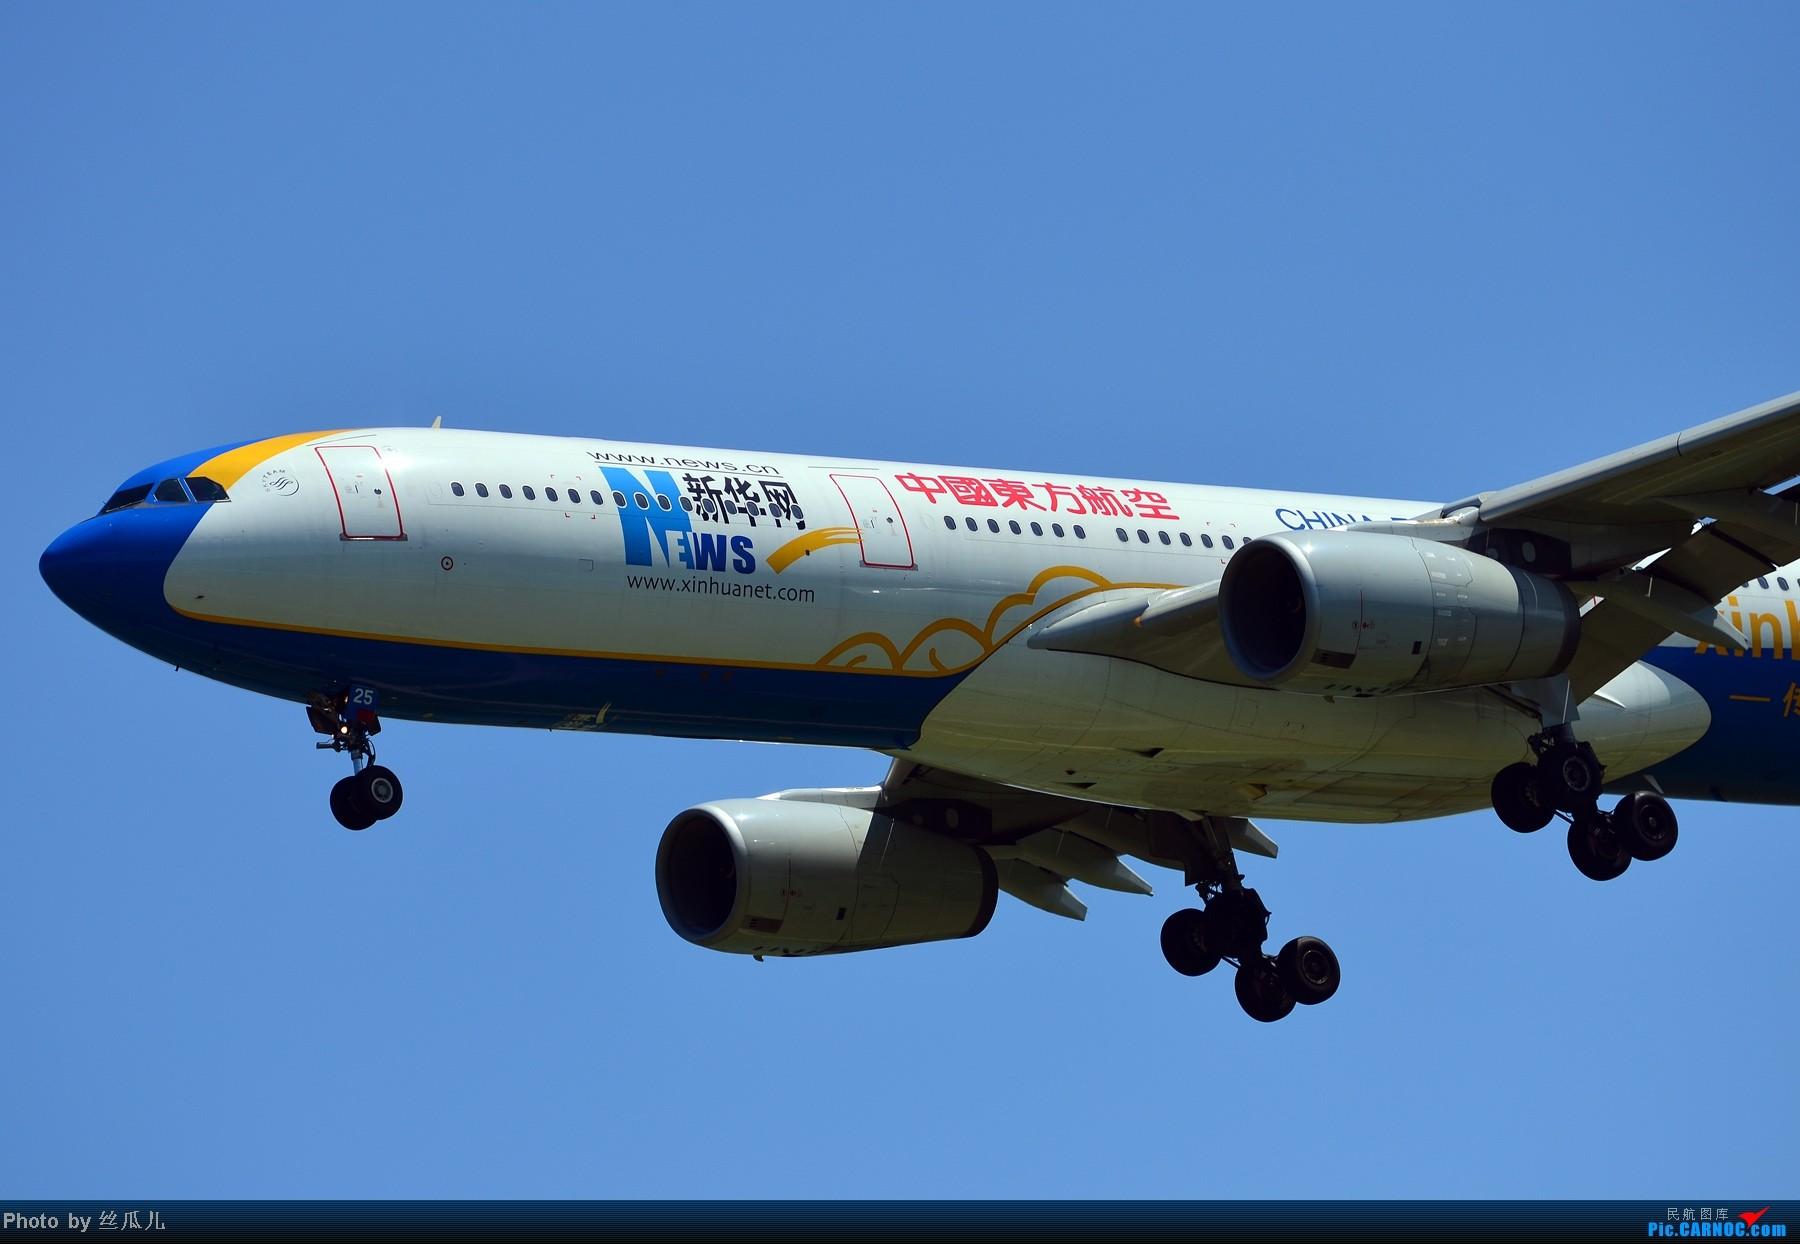 Re:[原创]发一组东航B-6125新华网,发完睡觉 AIRBUS A330-300 B-6125 中国北京首都机场